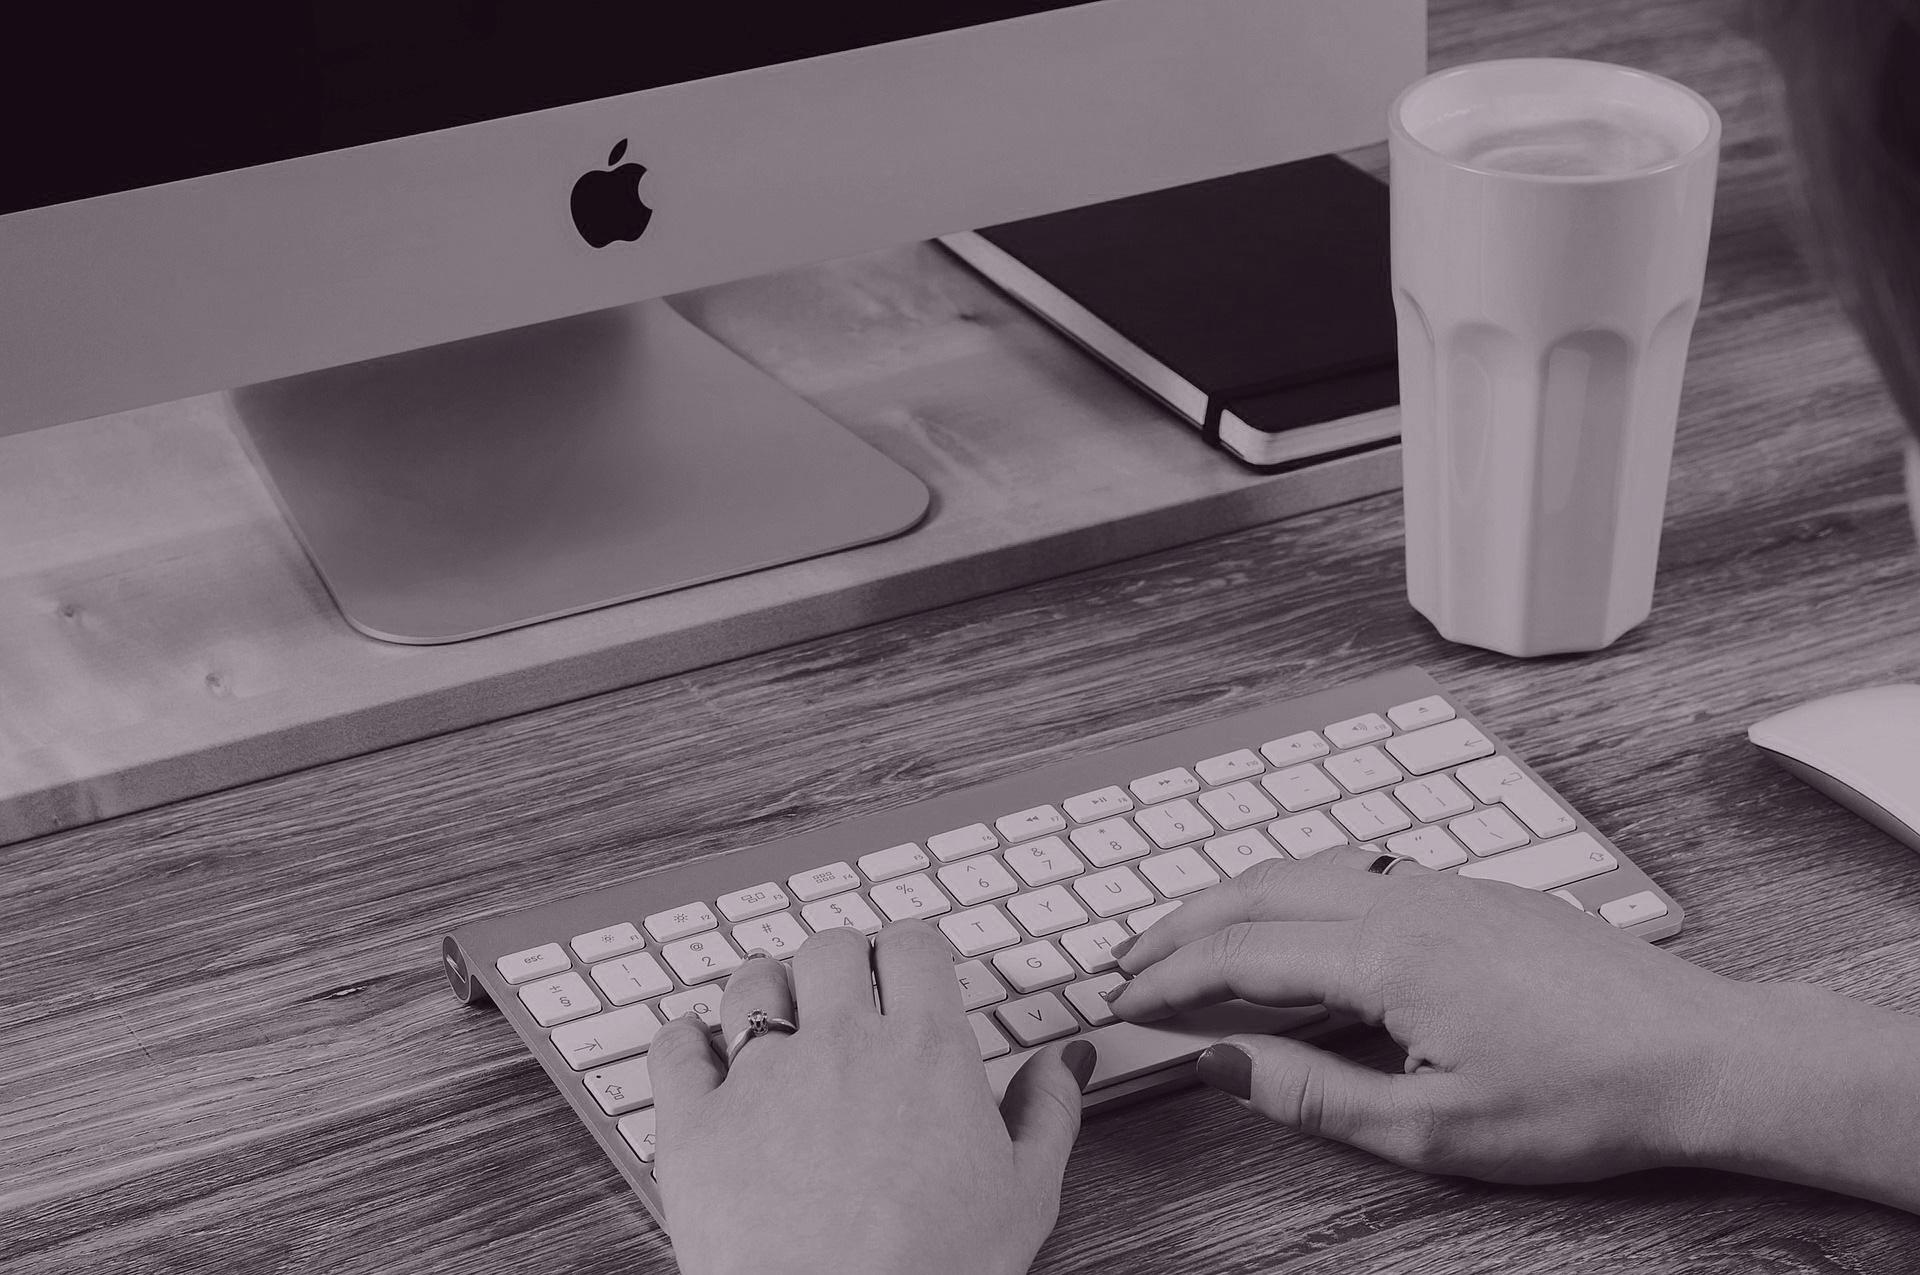 Imagebild Keybord mit Händen